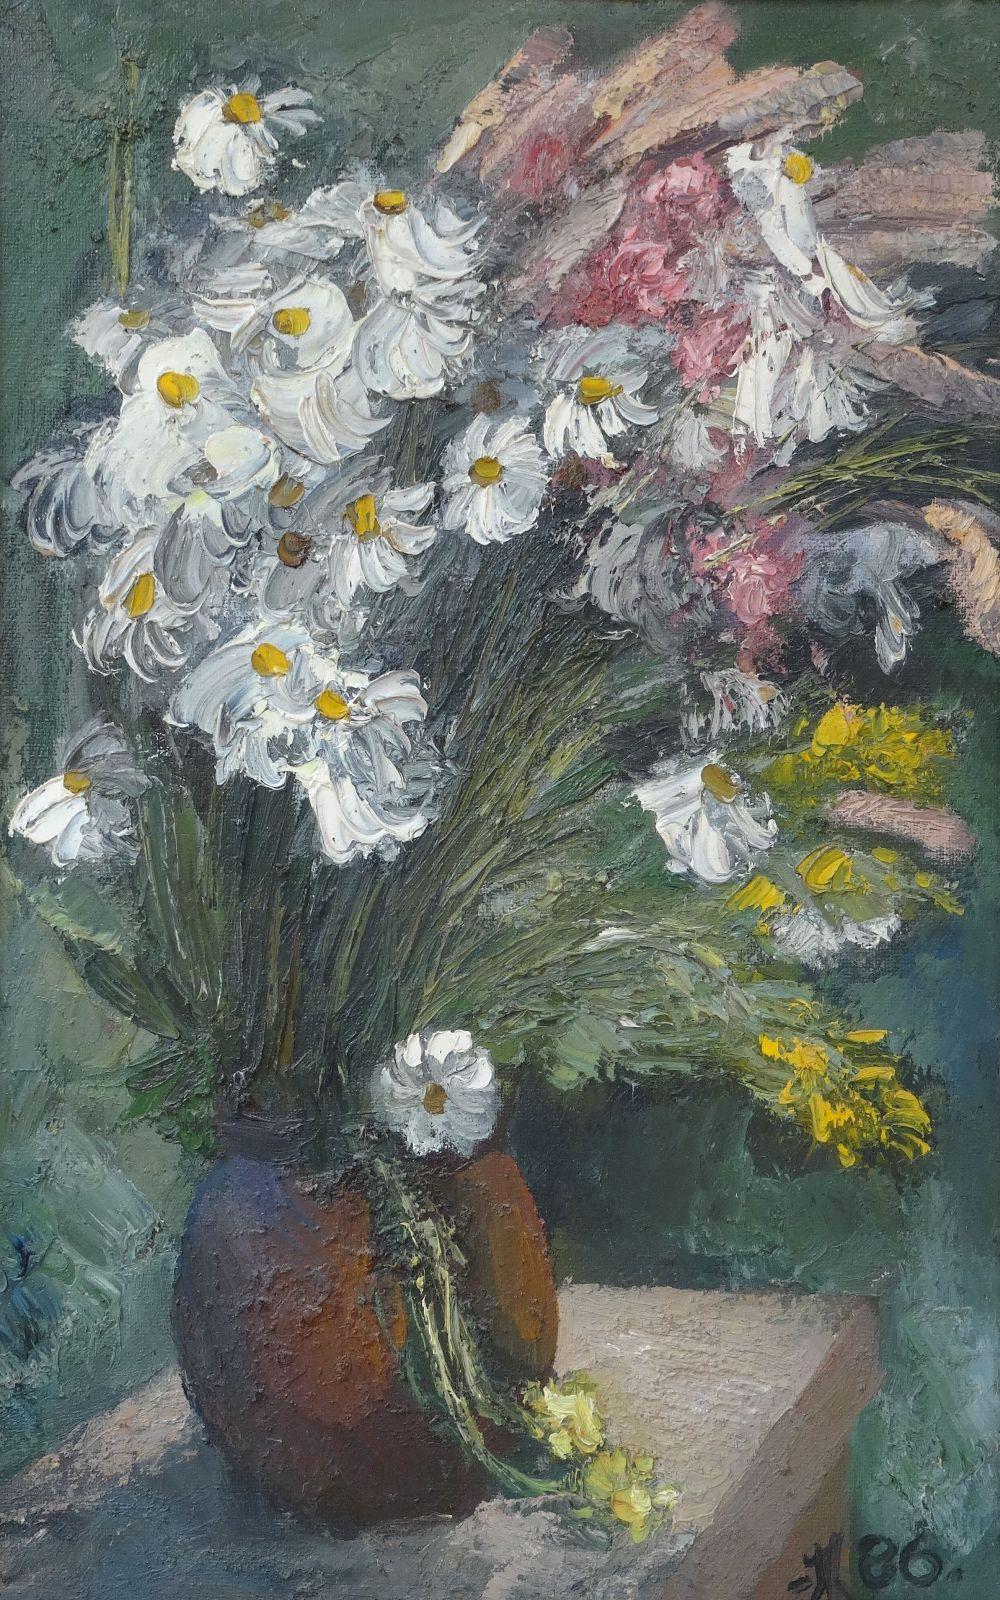 Flowers. 1986. Oil on cardboard, 72x46 cm